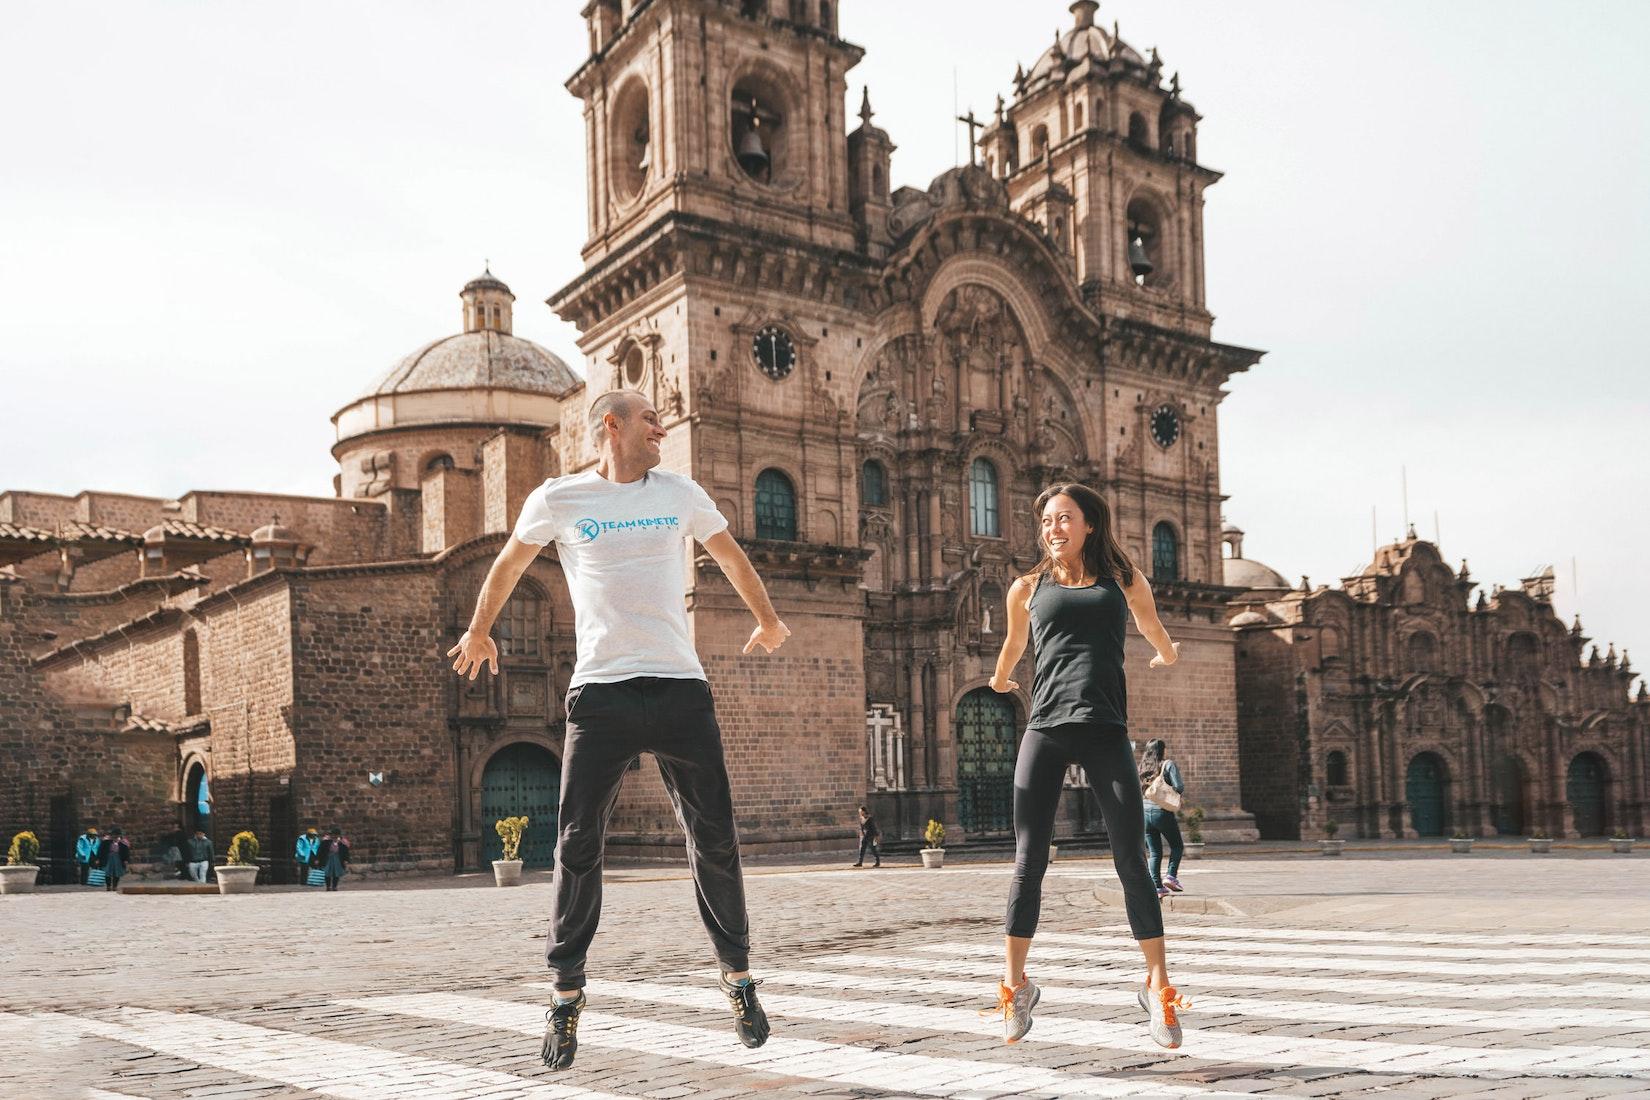 Ryan & Alex Duo Life: Couple Travel and Fitness Motivators